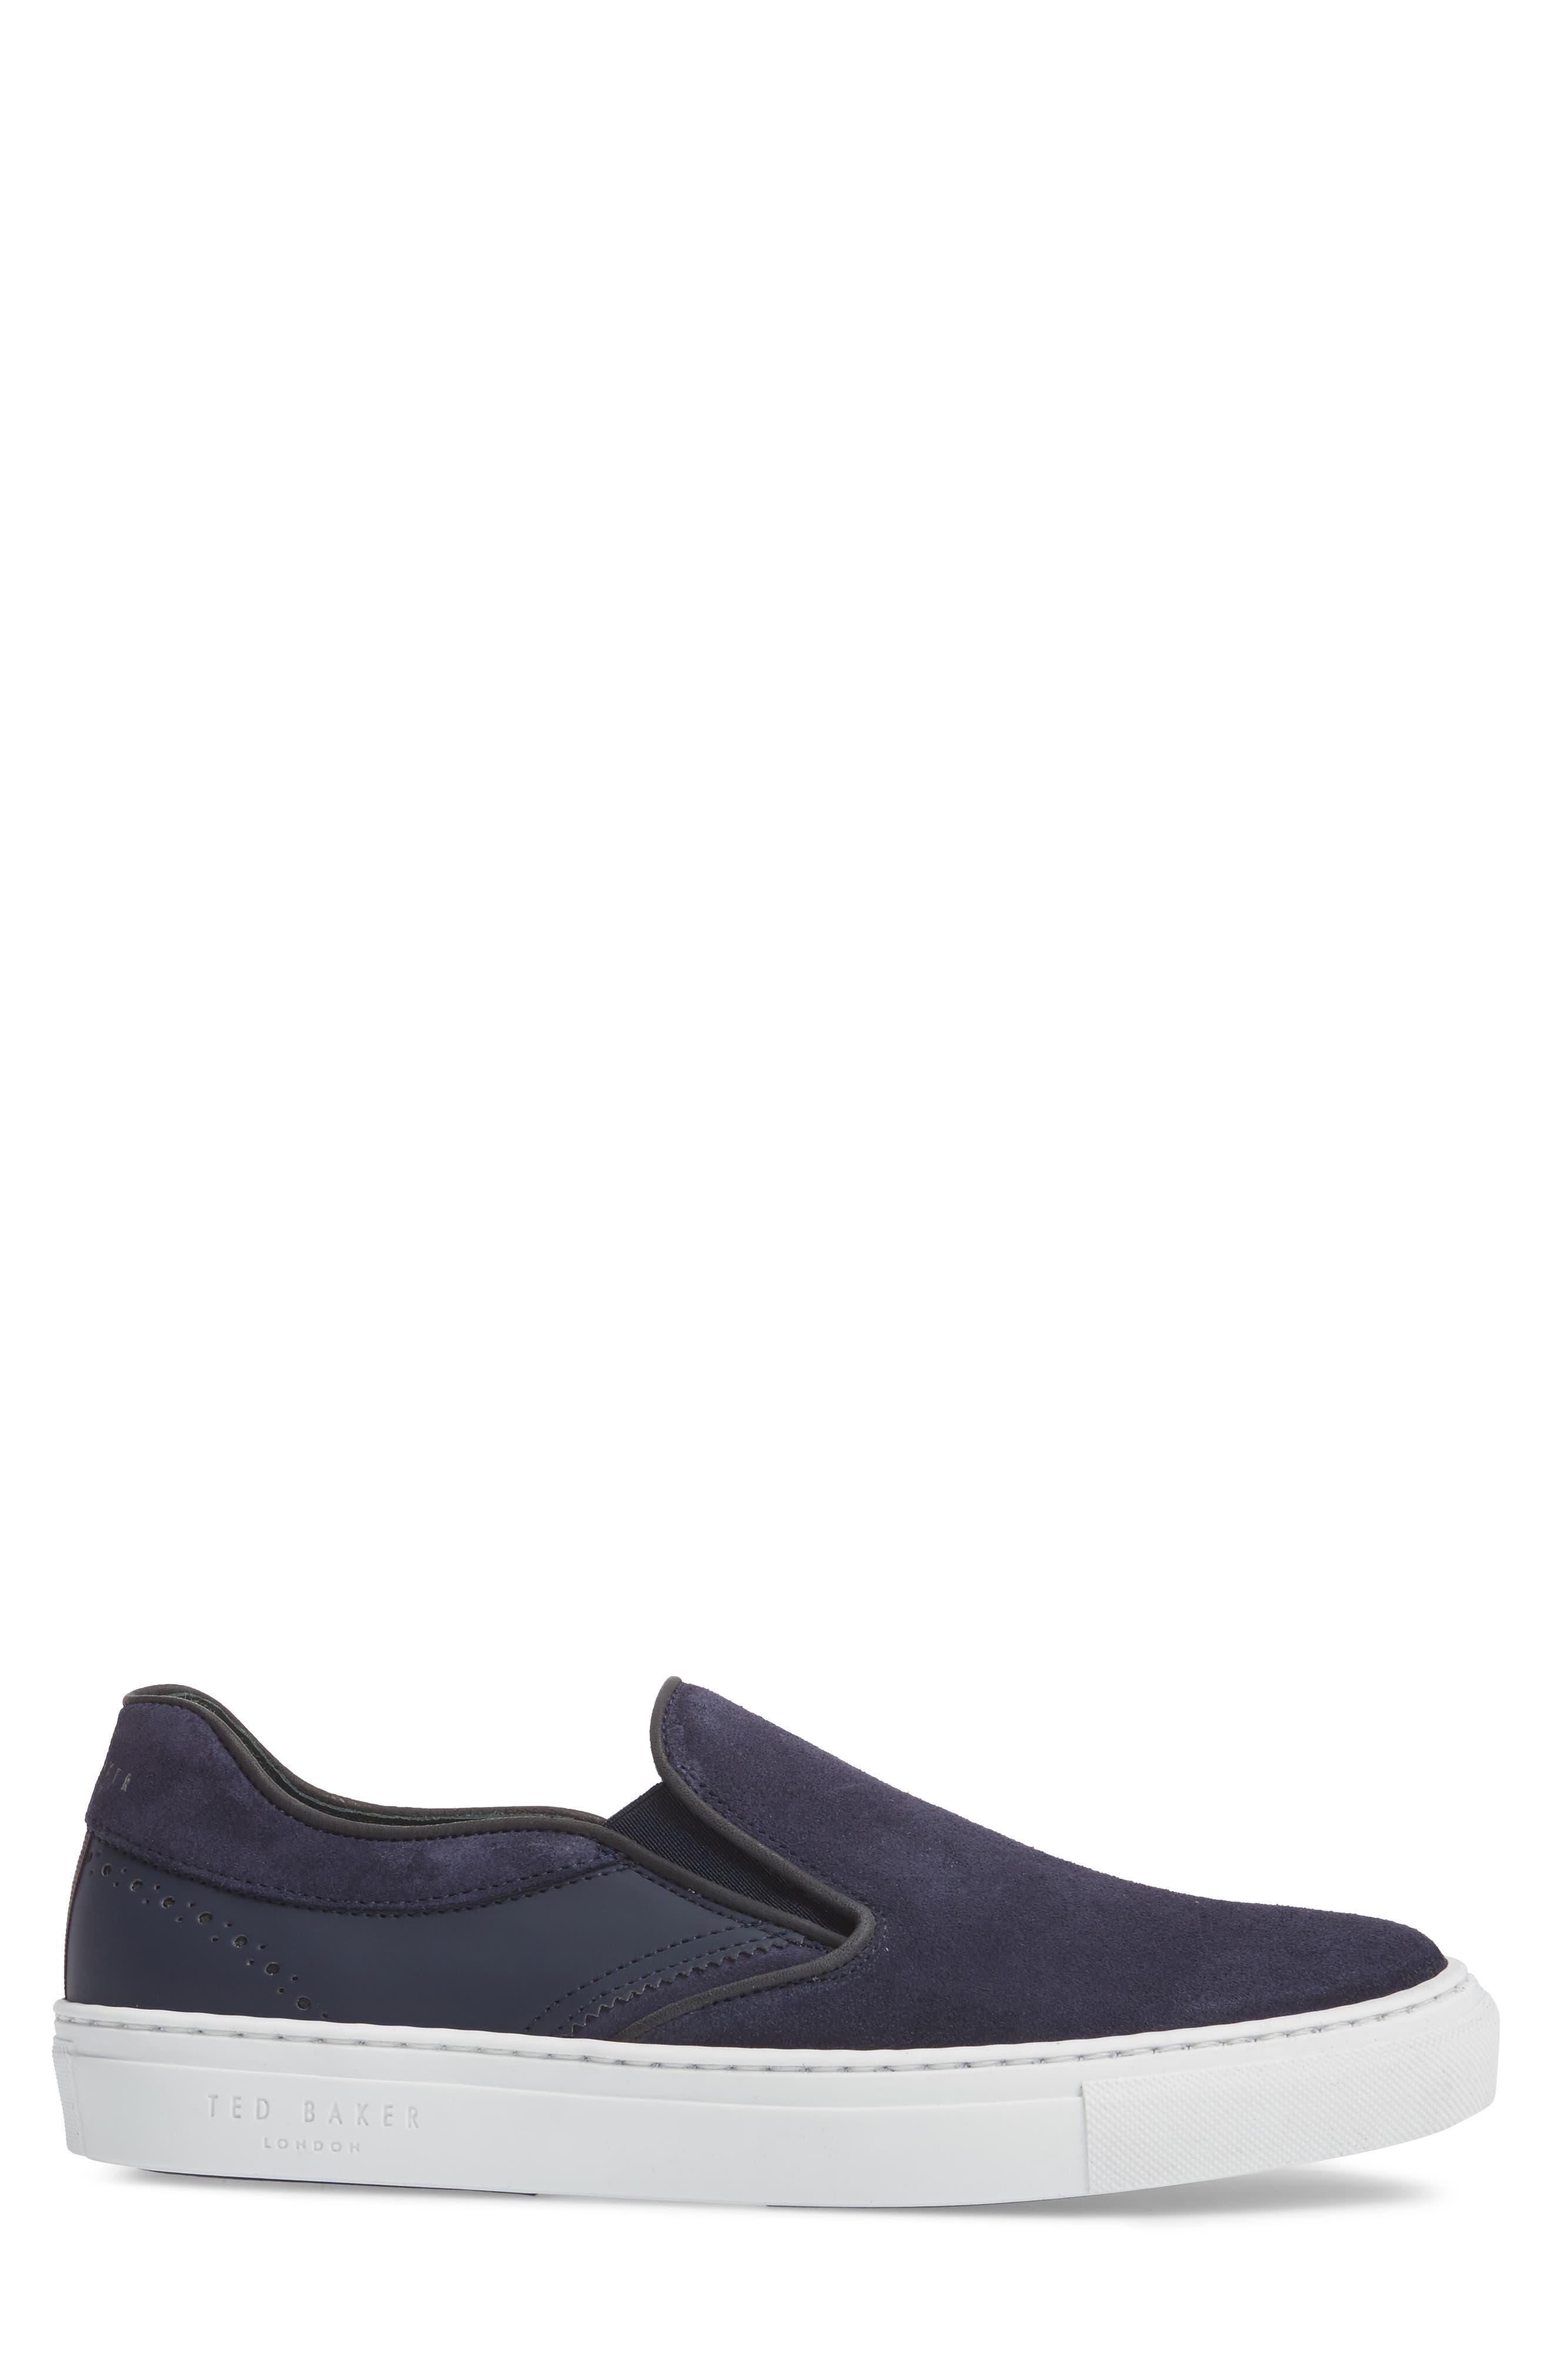 Reaine Brogued Slip-On Sneaker,                             Alternate thumbnail 3, color,                             Dark Blue Leather